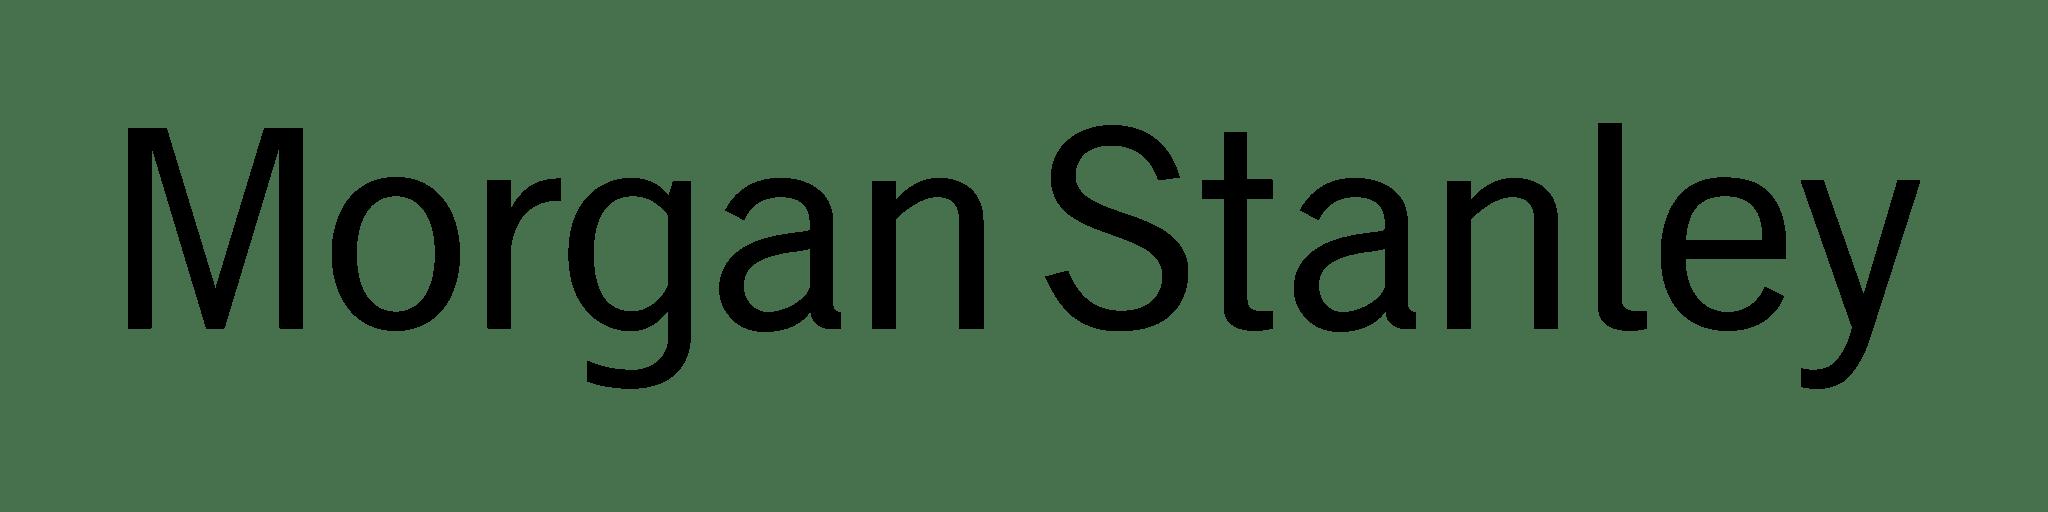 MorganStanleyTRANS.png